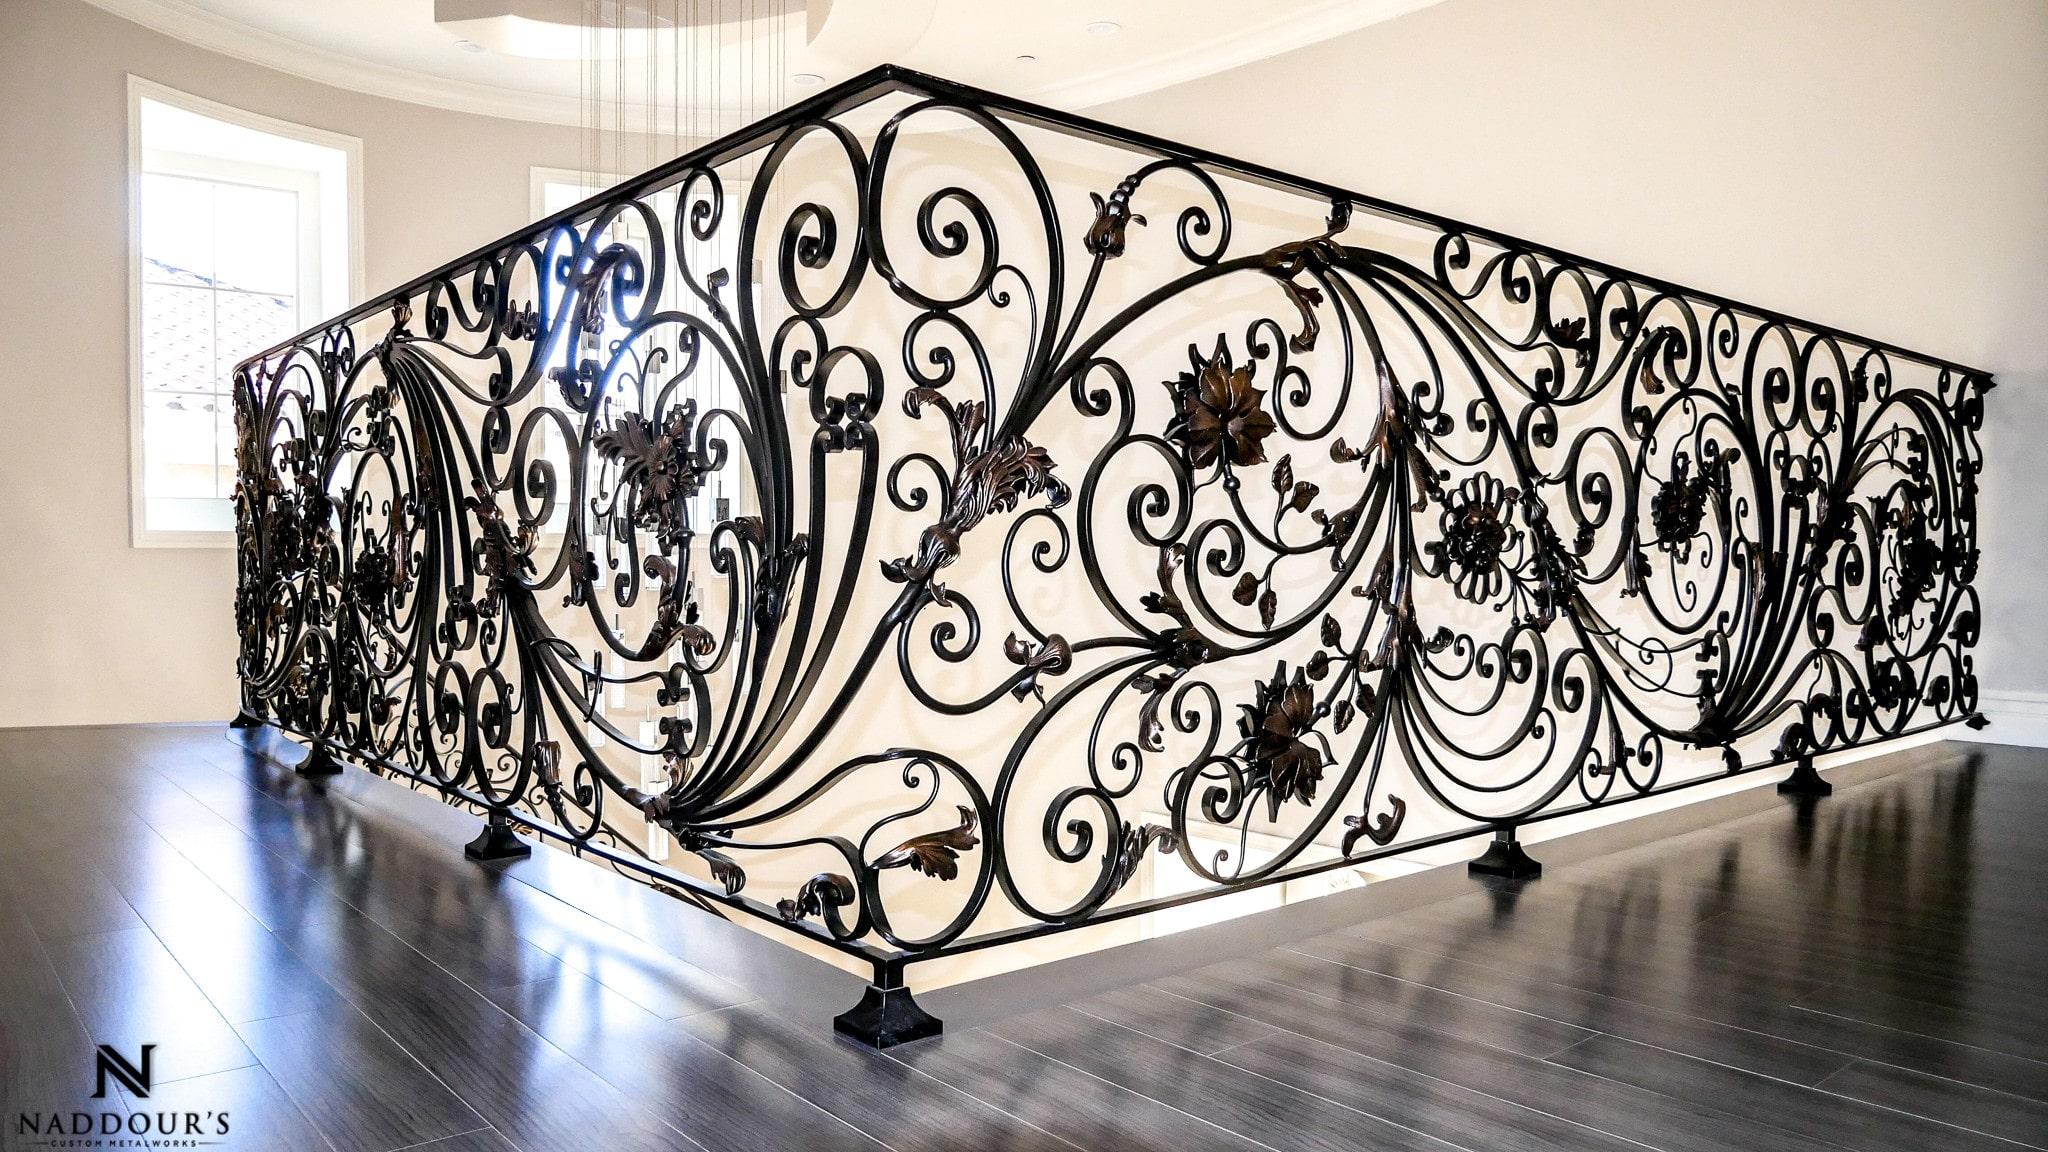 Naddour's Custom Metalworks Custom Staircase Railing Featured Project in Portola Hilla California .jpg